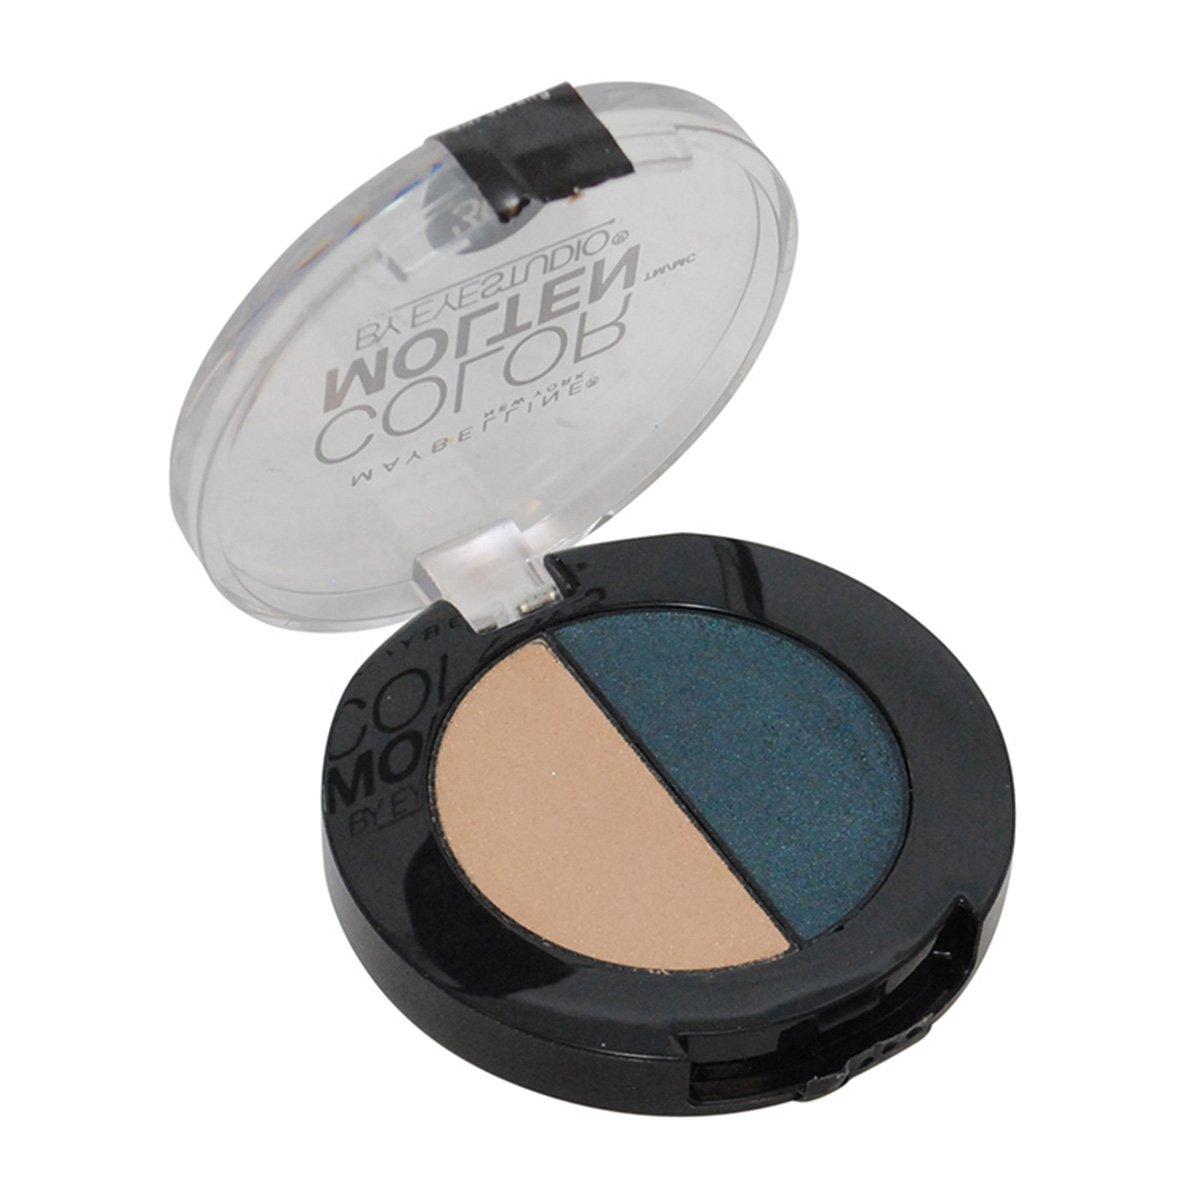 Maybelline New York Eye Studio Color Molten Cream Eye shadow, Teal Twist, 1 Count